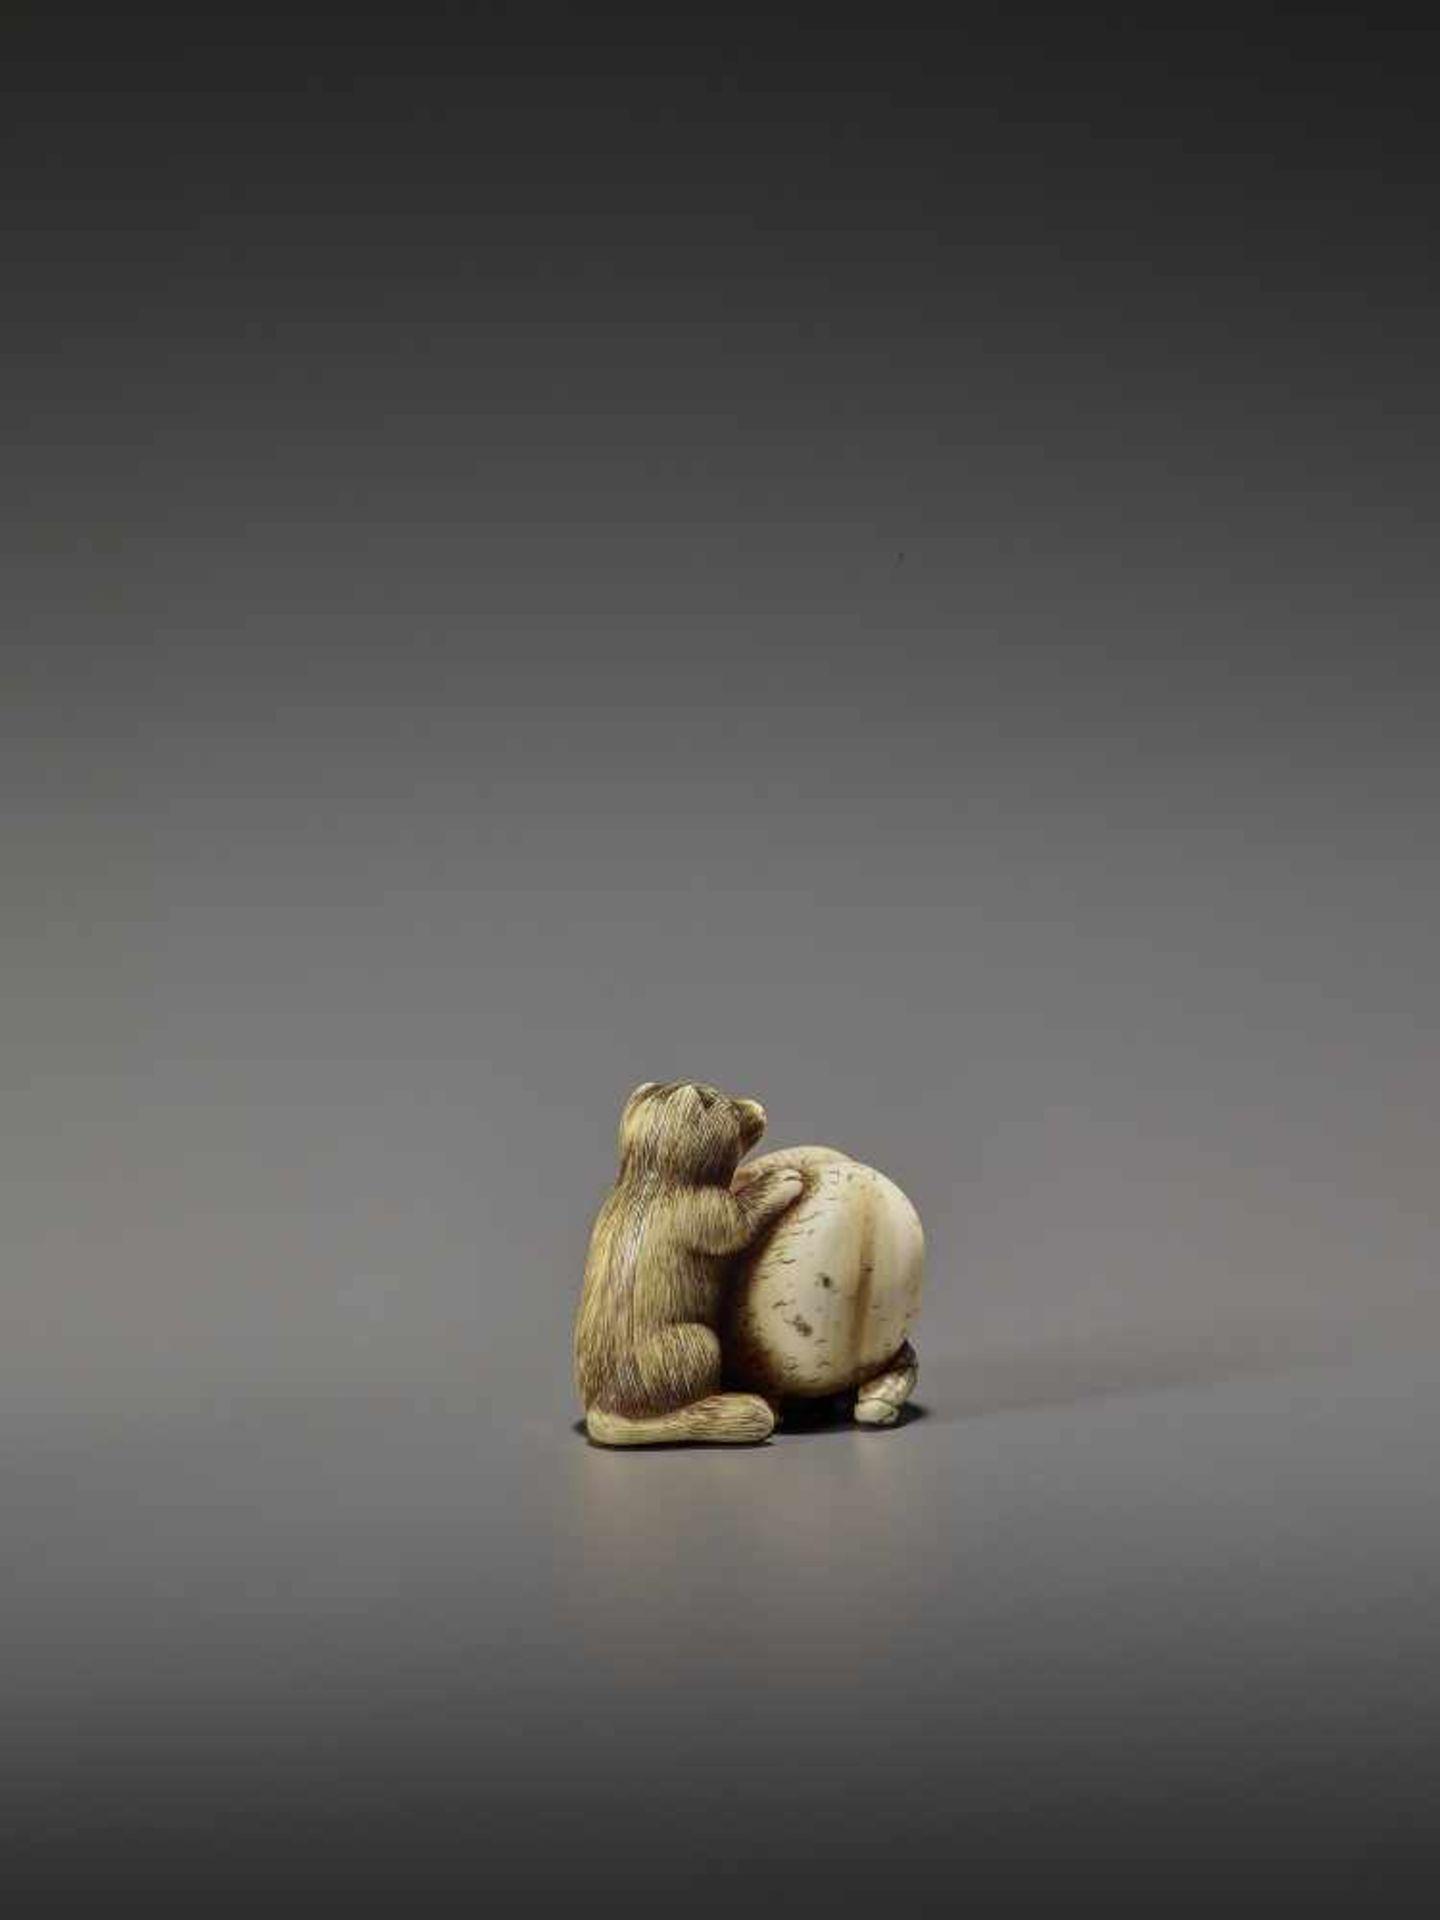 SHUNGETSU: IVORY NETSUKE OF A TANUKI SUFFOCATING A HUNTER WITH HIS SCROTUM By Shungetsu, signed - Image 6 of 11